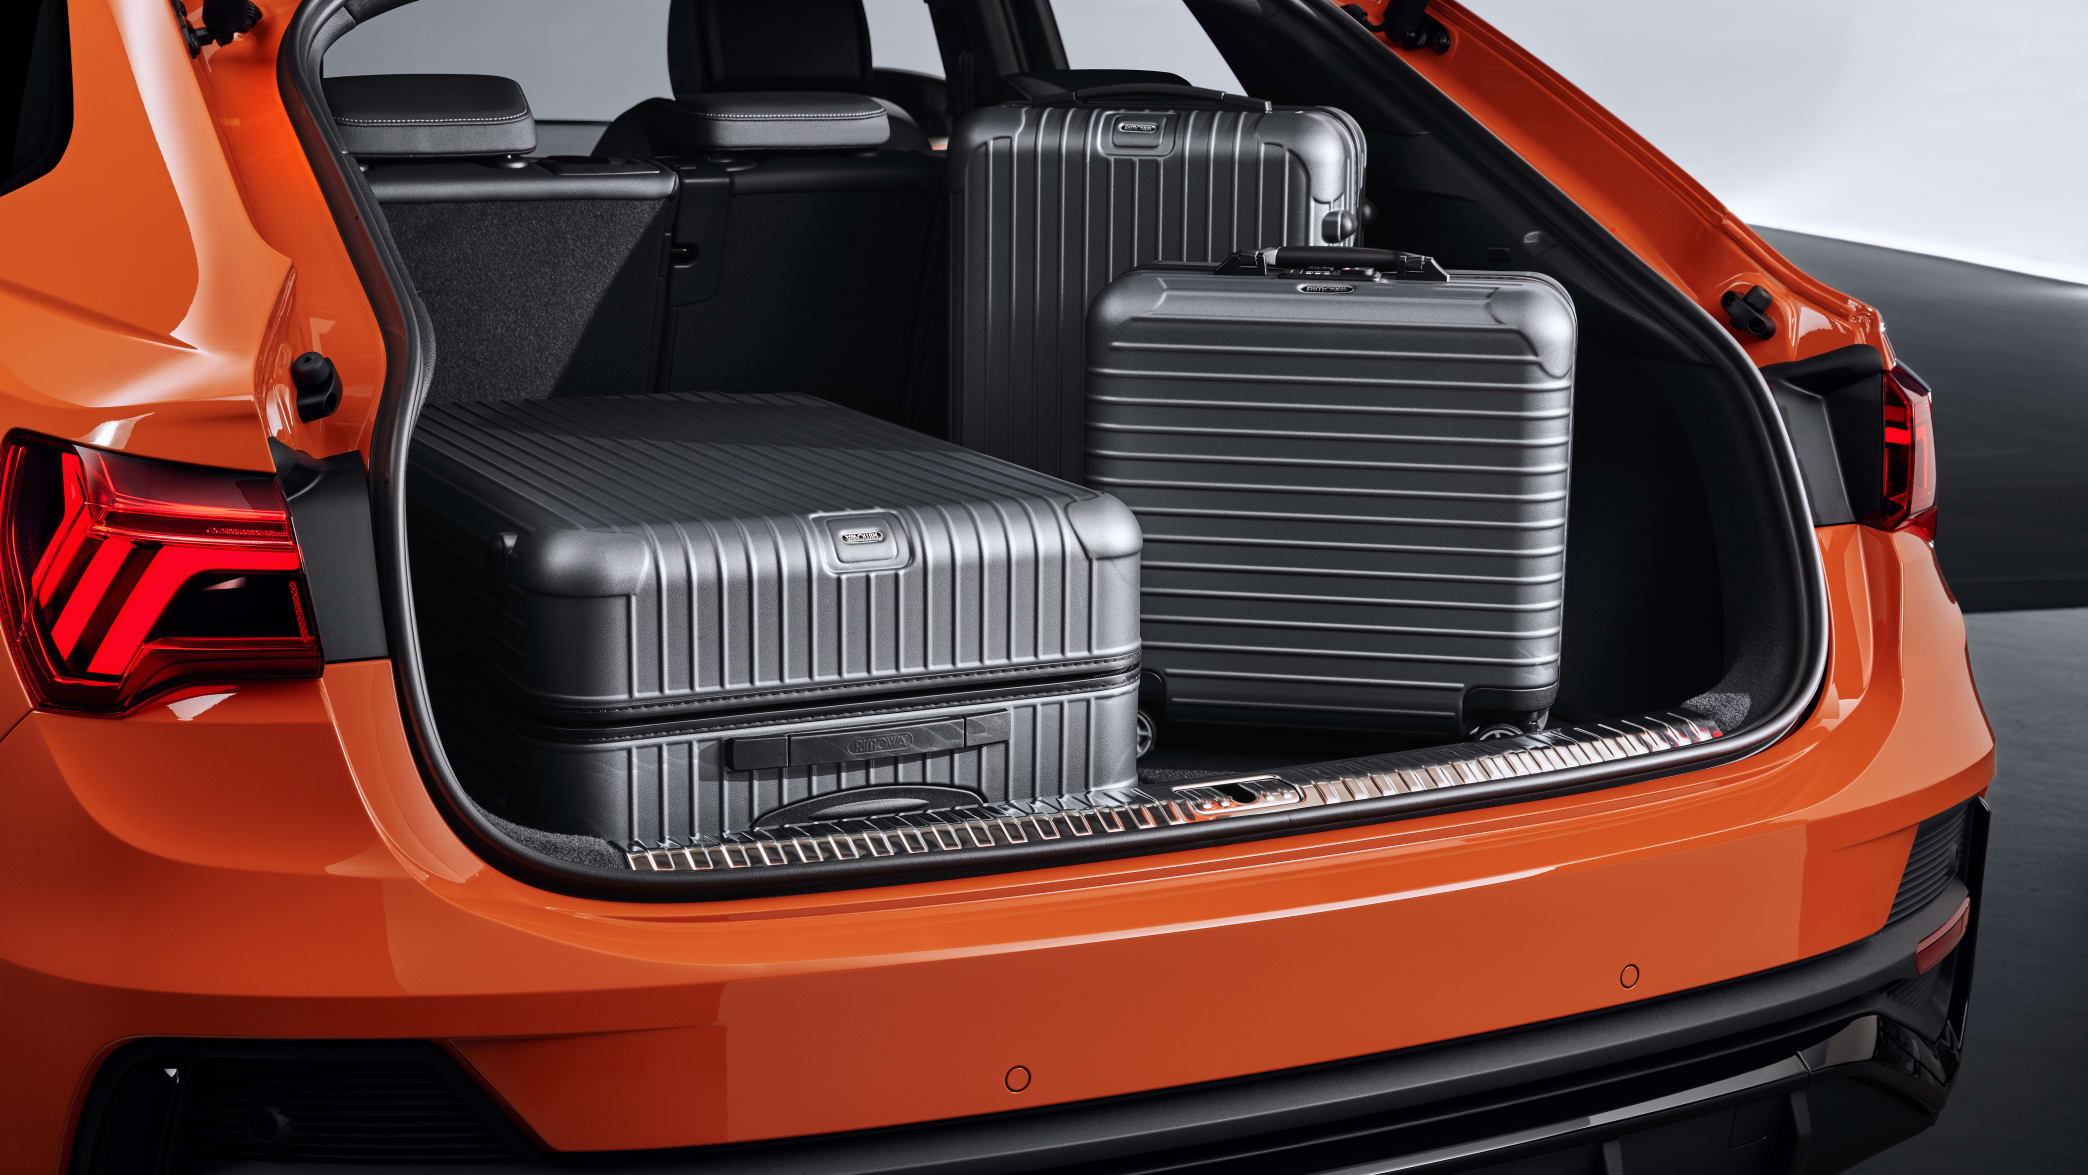 Blick in den geöffneten Kofferraum des Audi Q3 Sportback